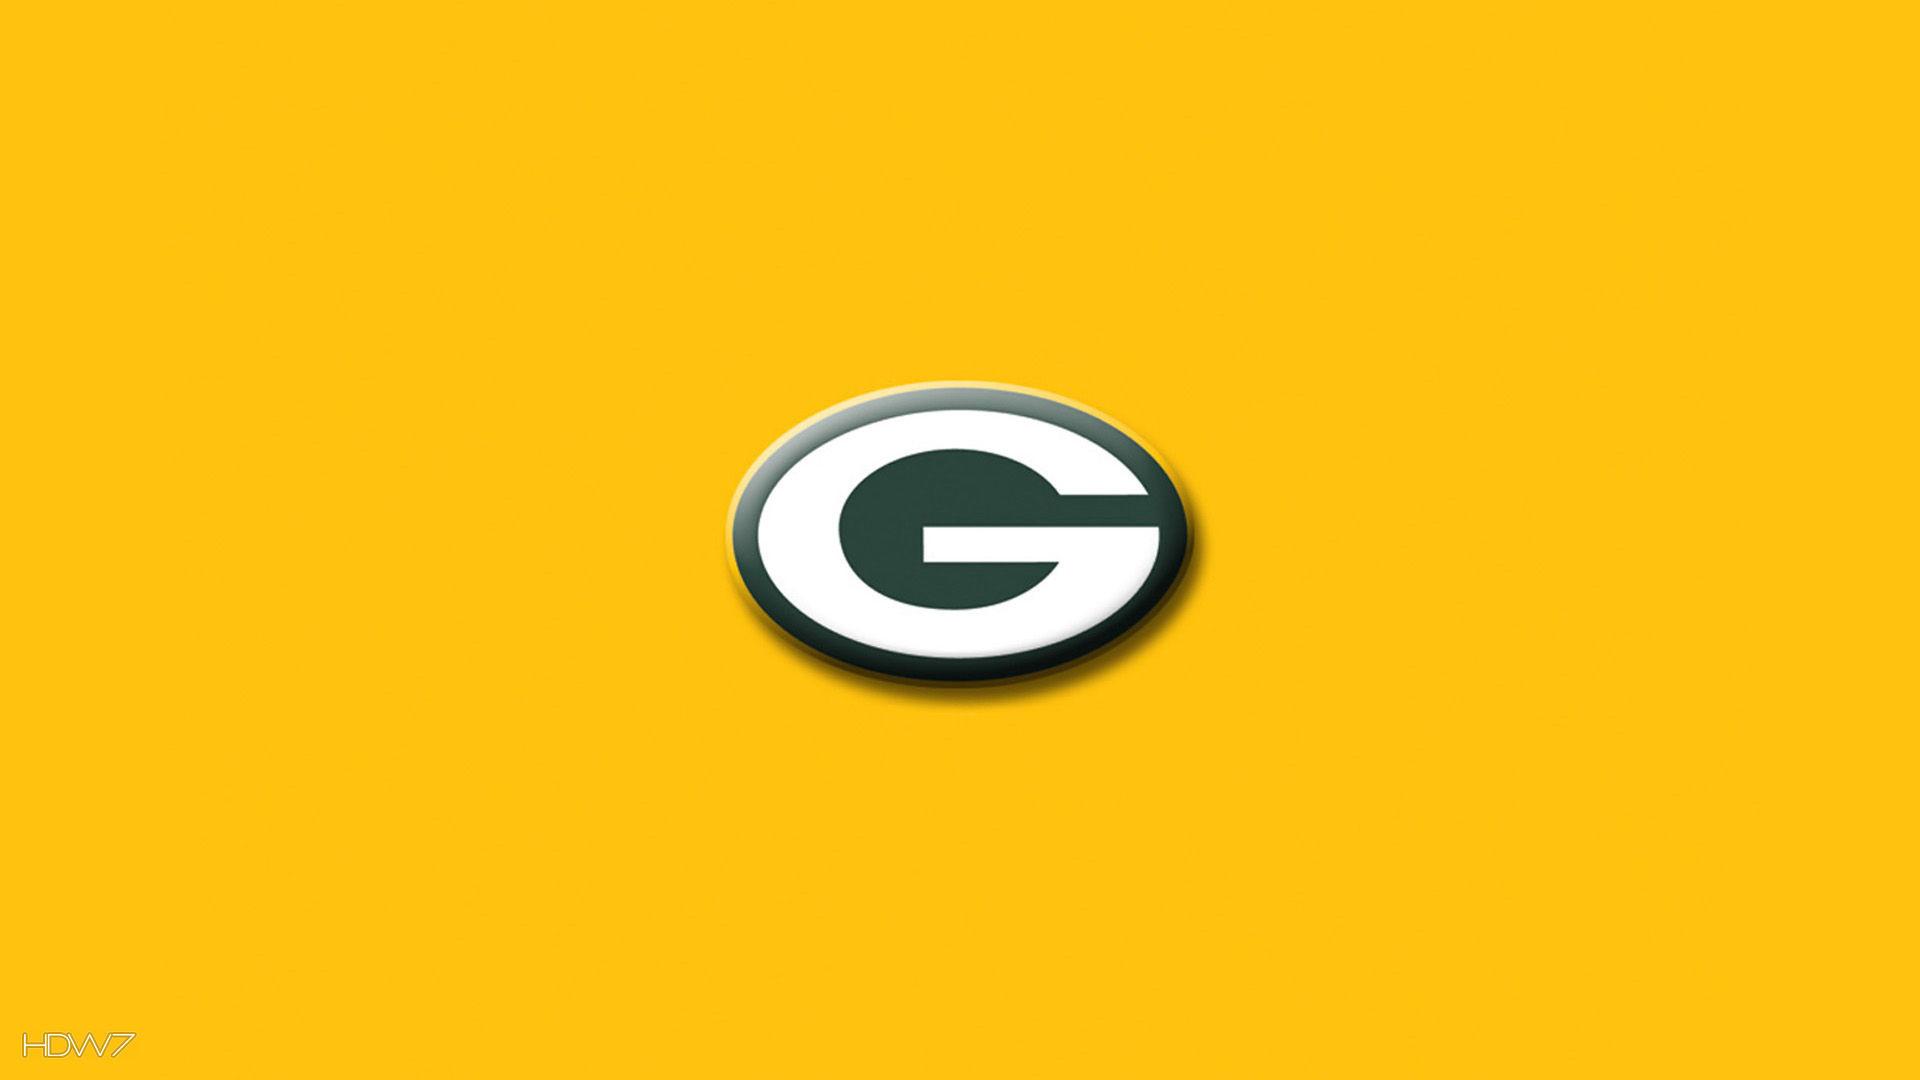 green bay packers simple logo yellow wallpaper